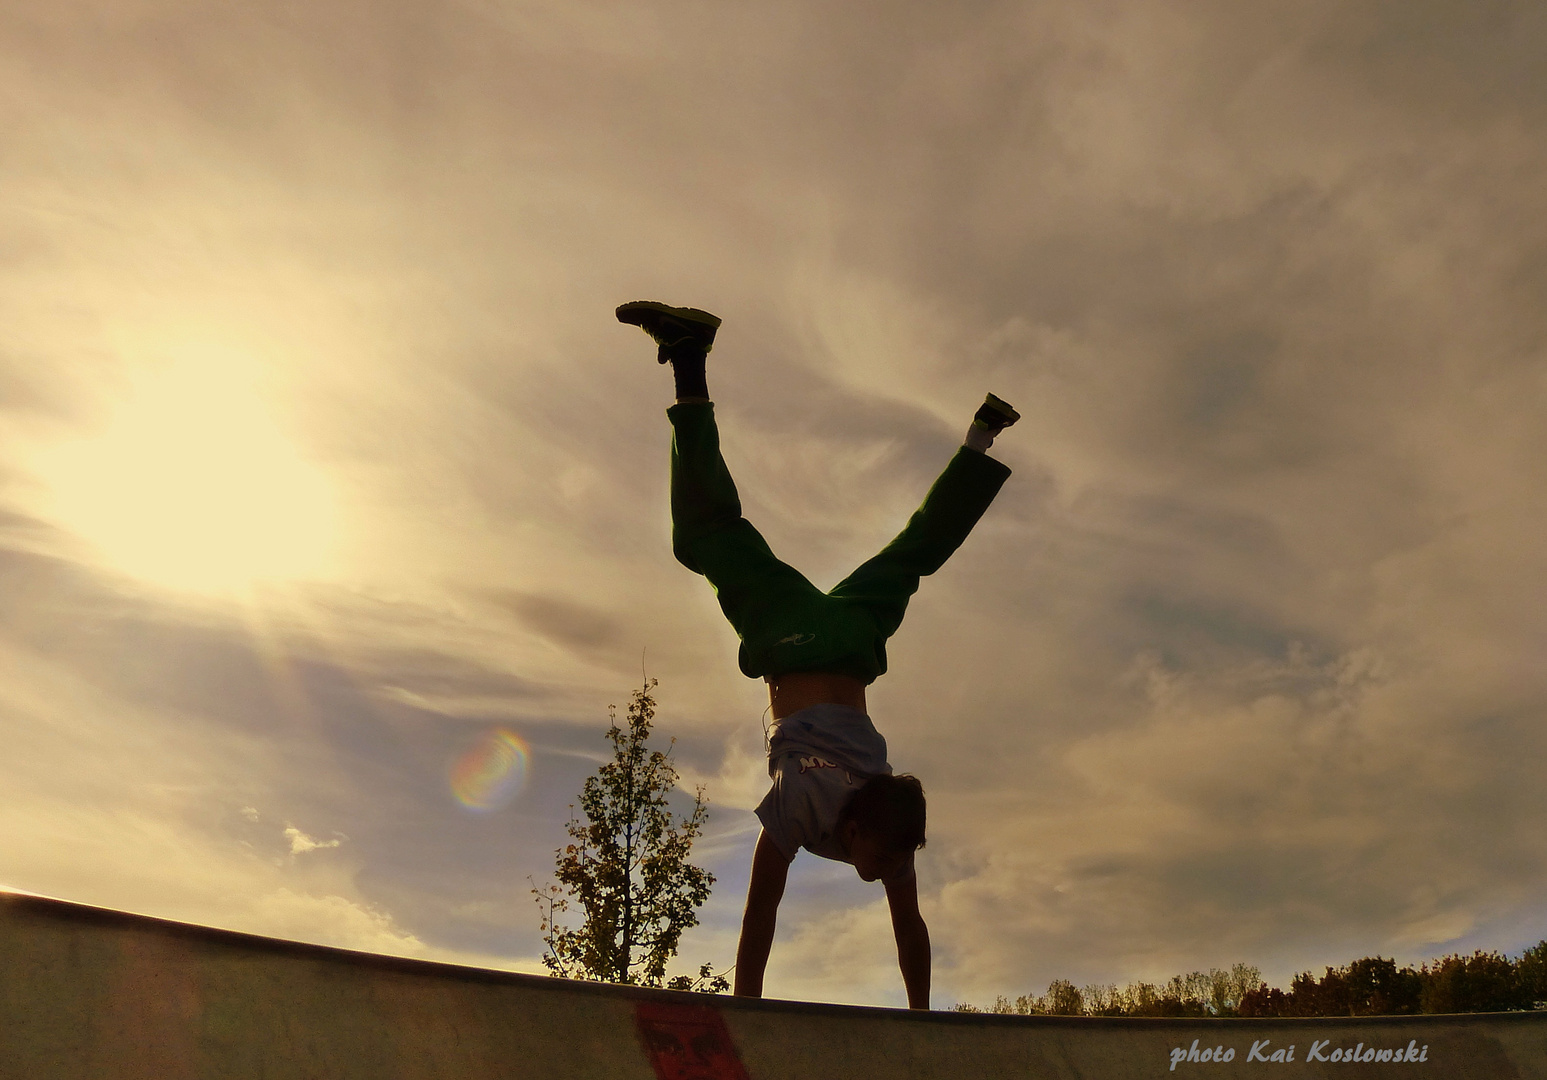 sportlich frei unterm Himmel